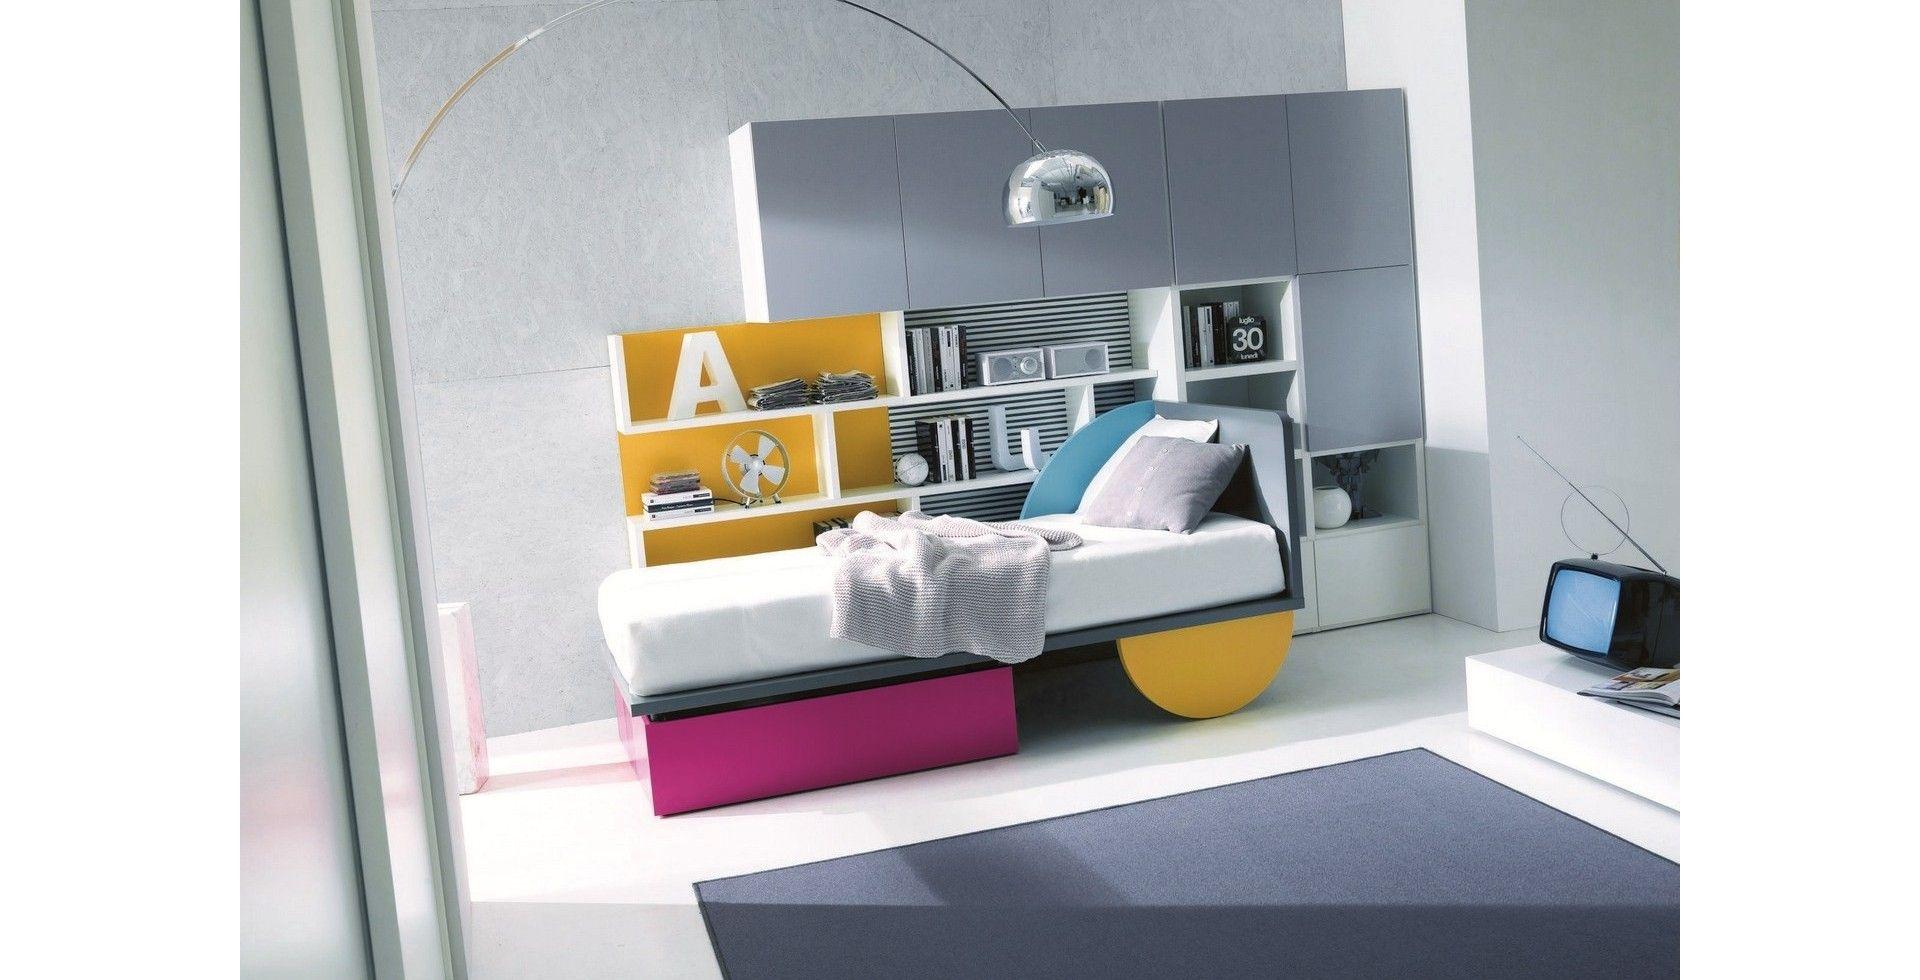 Camere Ragazzi Dielle.Cameretta K04 Camerette Dielle Teenagers Bedrooms Bed